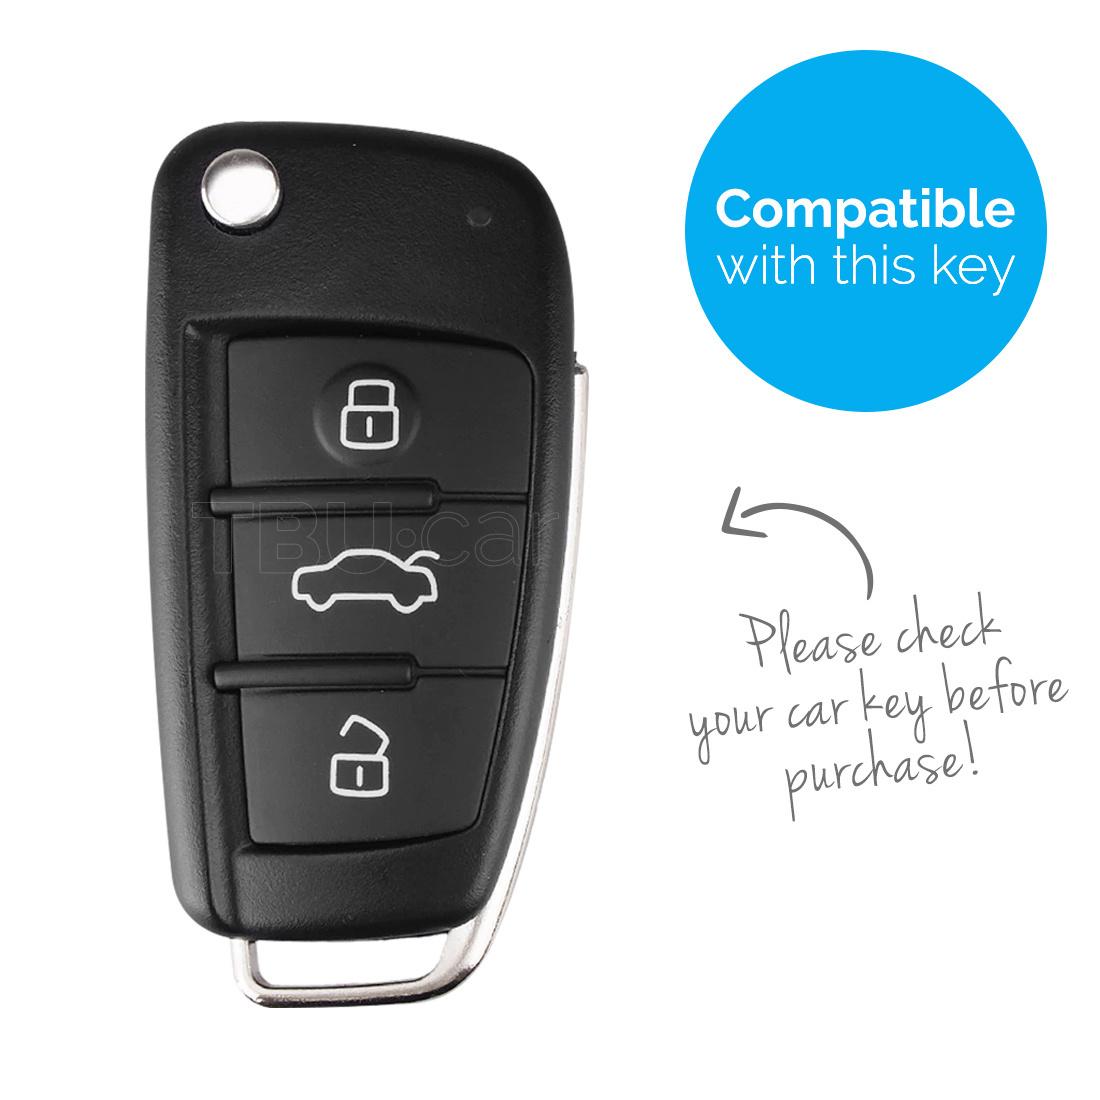 TBU car TBU car Sleutel cover compatibel met Audi - Silicone sleutelhoesje - beschermhoesje autosleutel - Rood